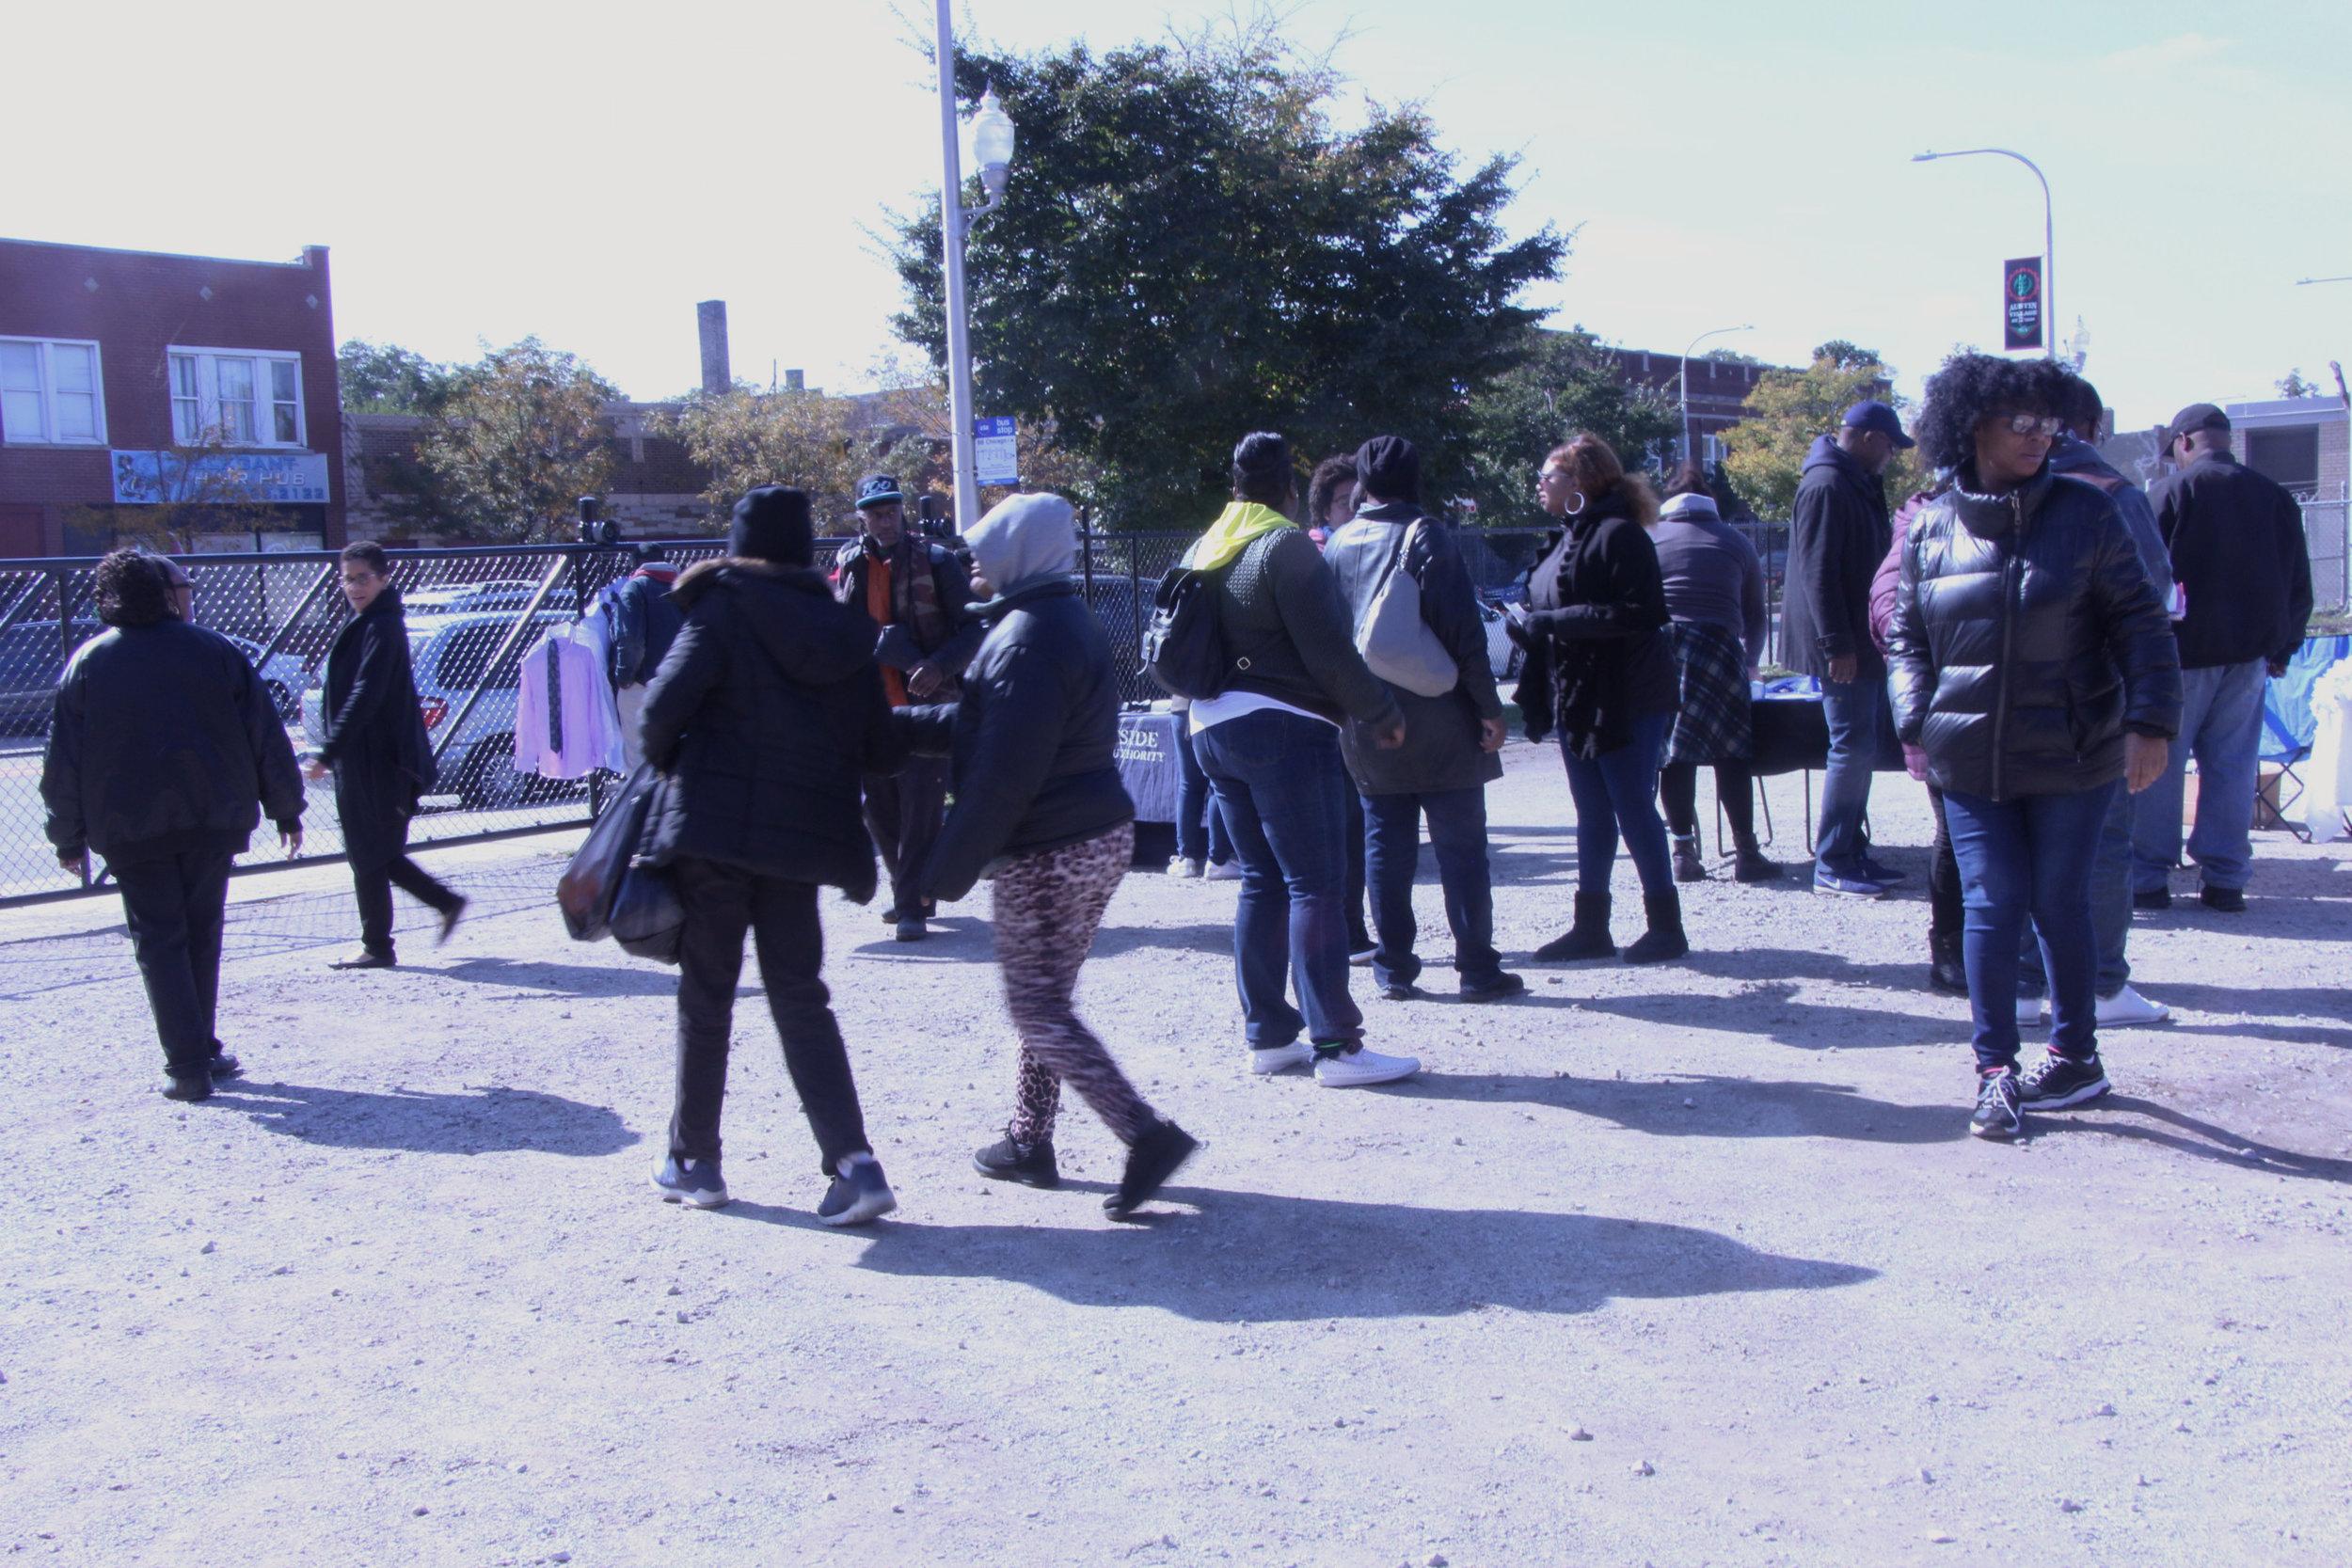 Community members started gravitating towards the speakers.